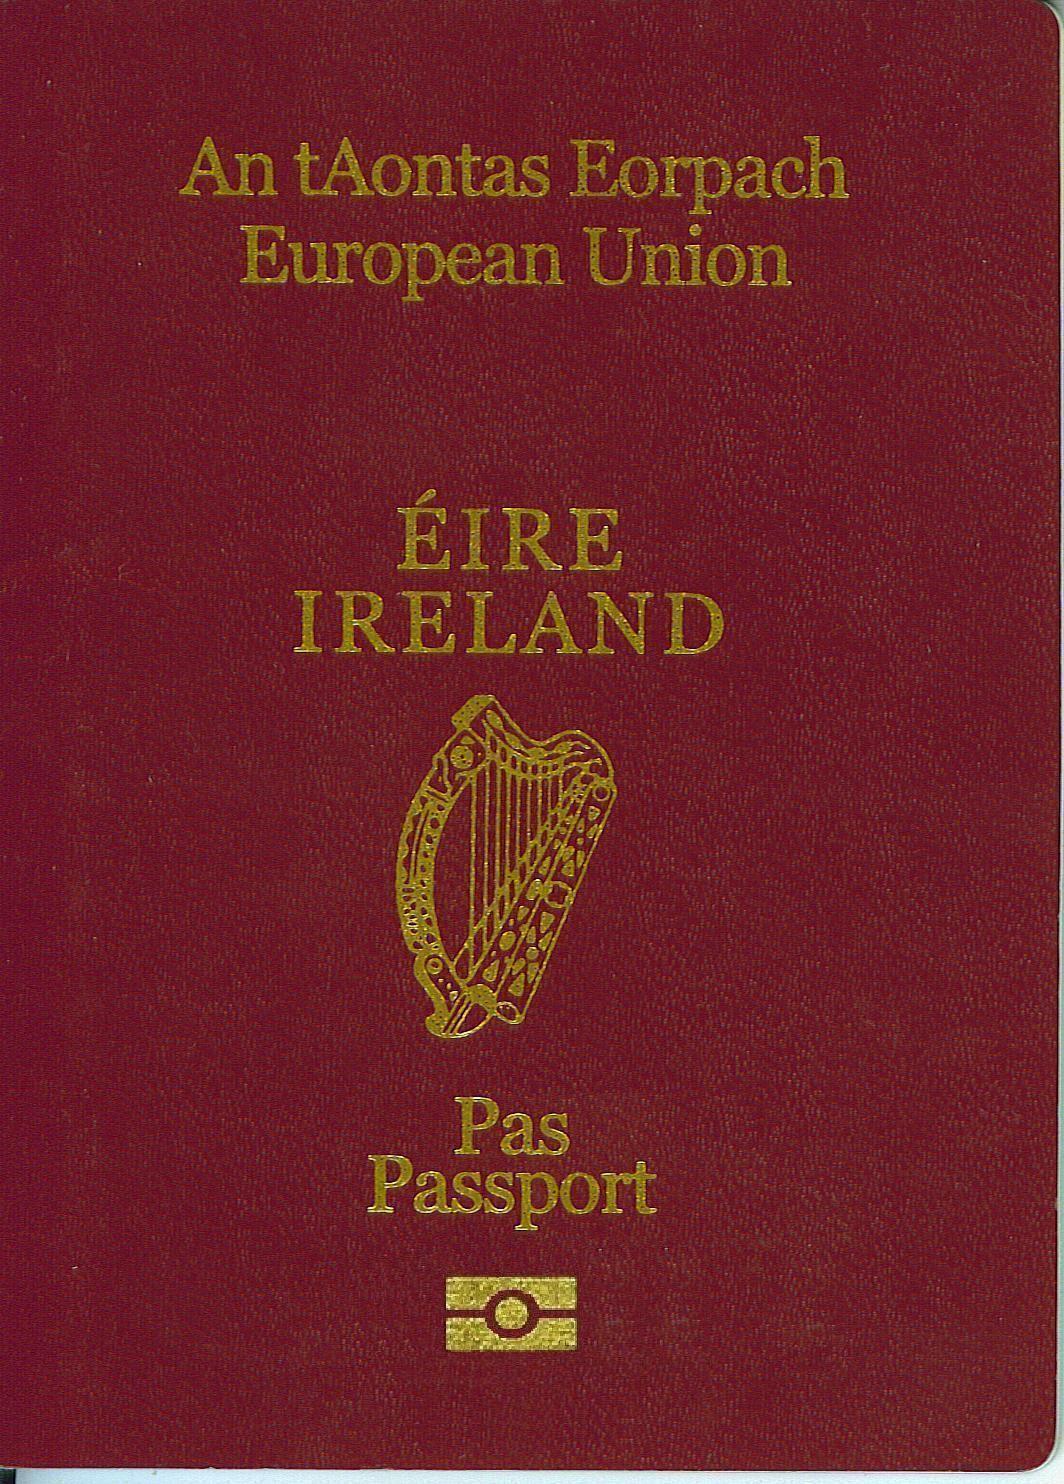 Watch How to Obtain an Irish Passport video